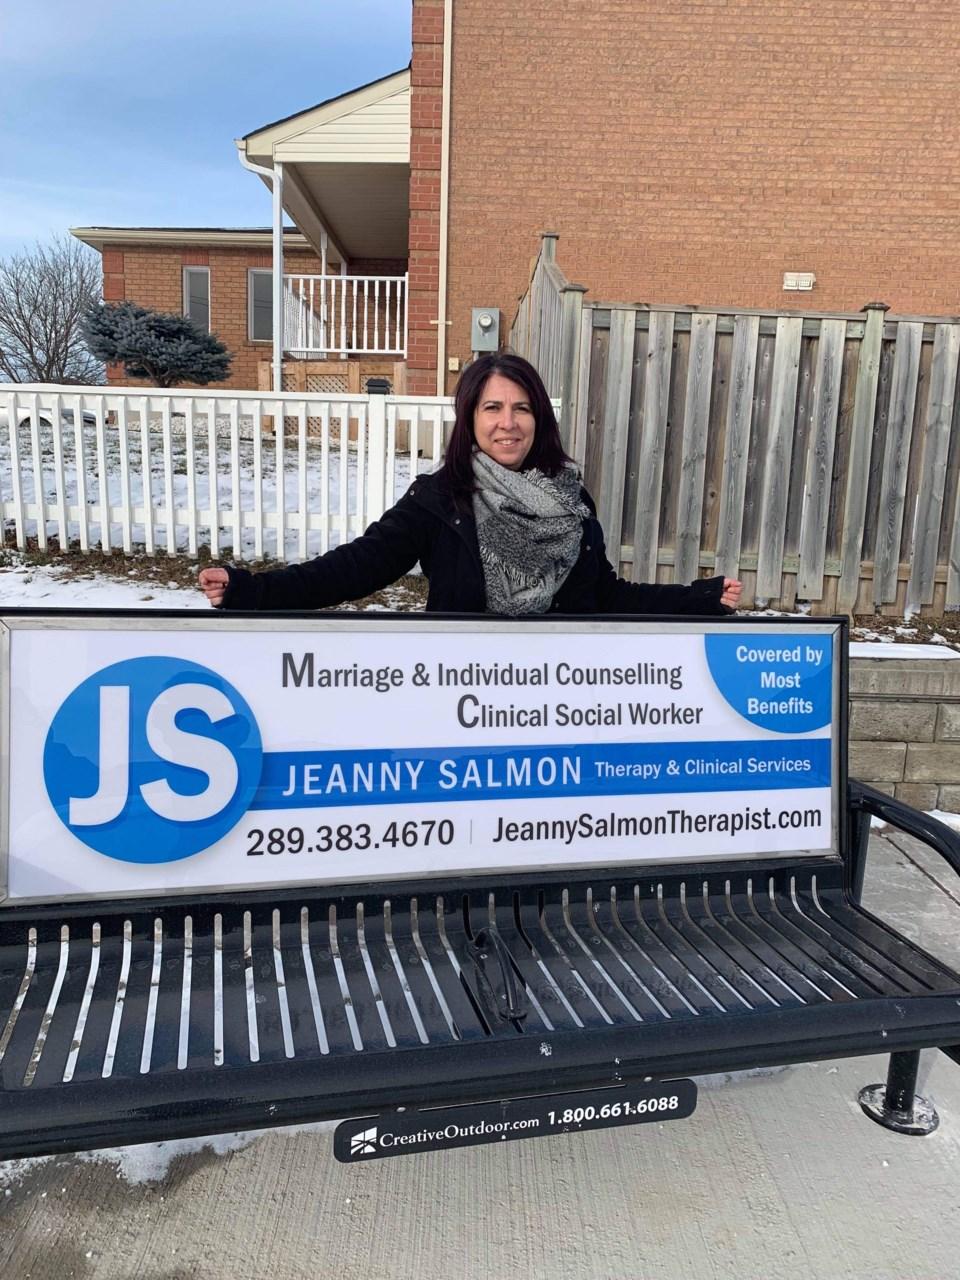 Jeanny Salmon